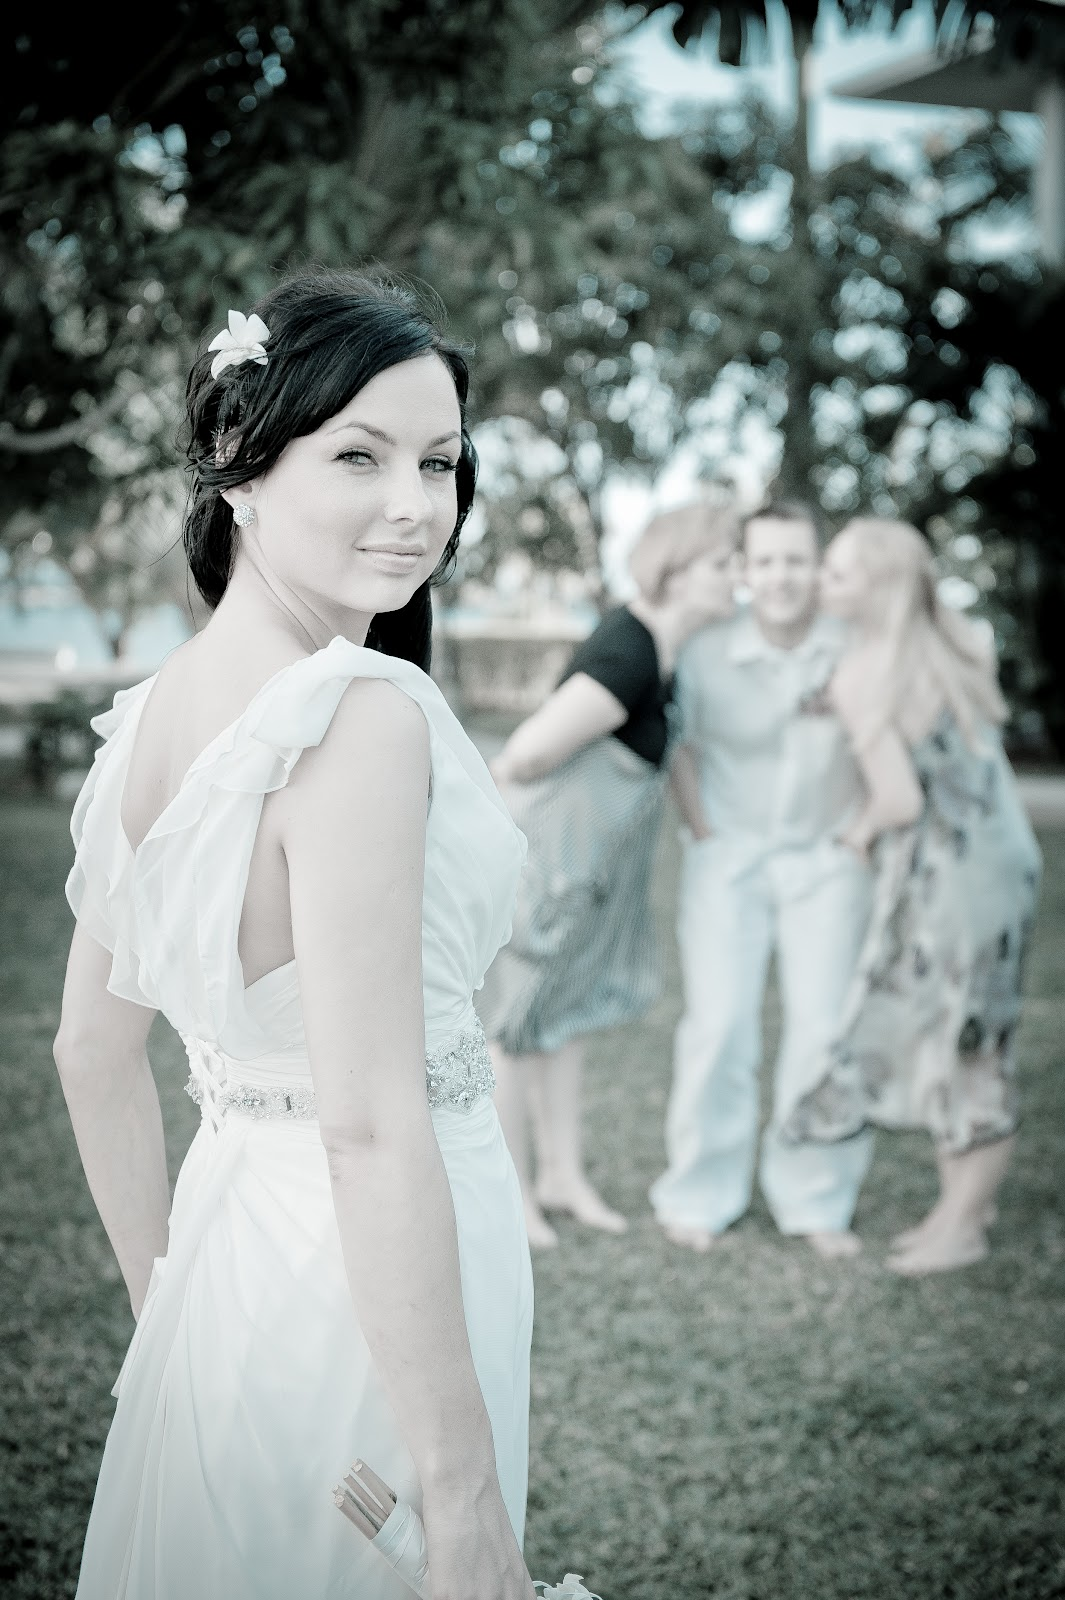 Funky Jamaican Wedding Dresses Photo - All Wedding Dresses ...